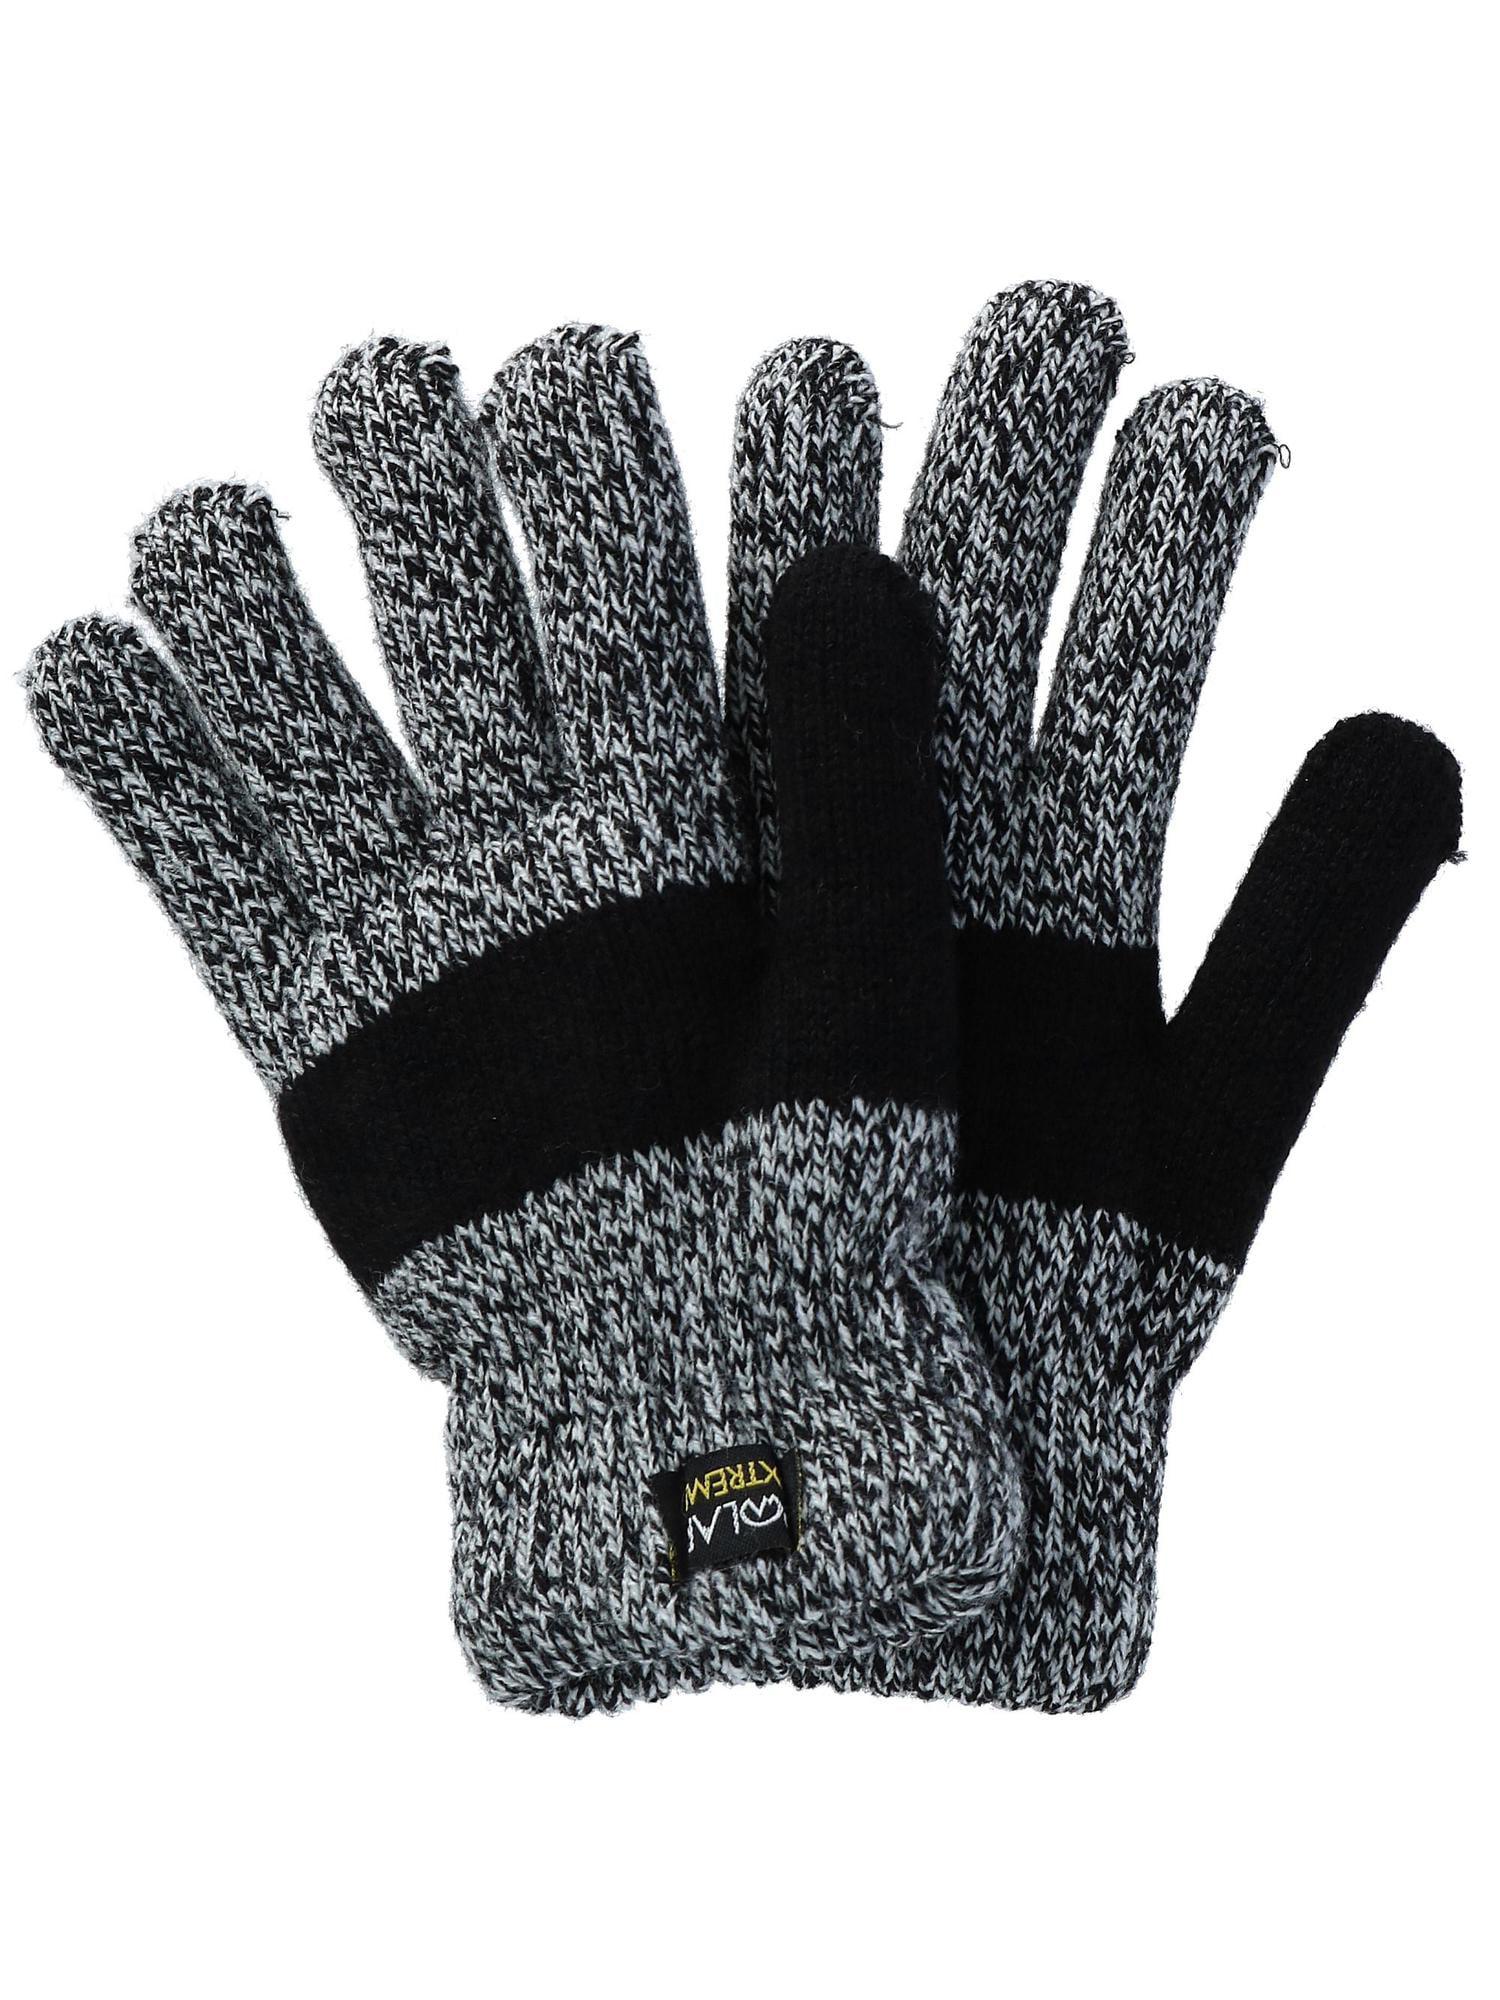 Women/'s Men/'s Knitted Gloves Winter Crochet Touch Screen Gloves Iphone Samsung